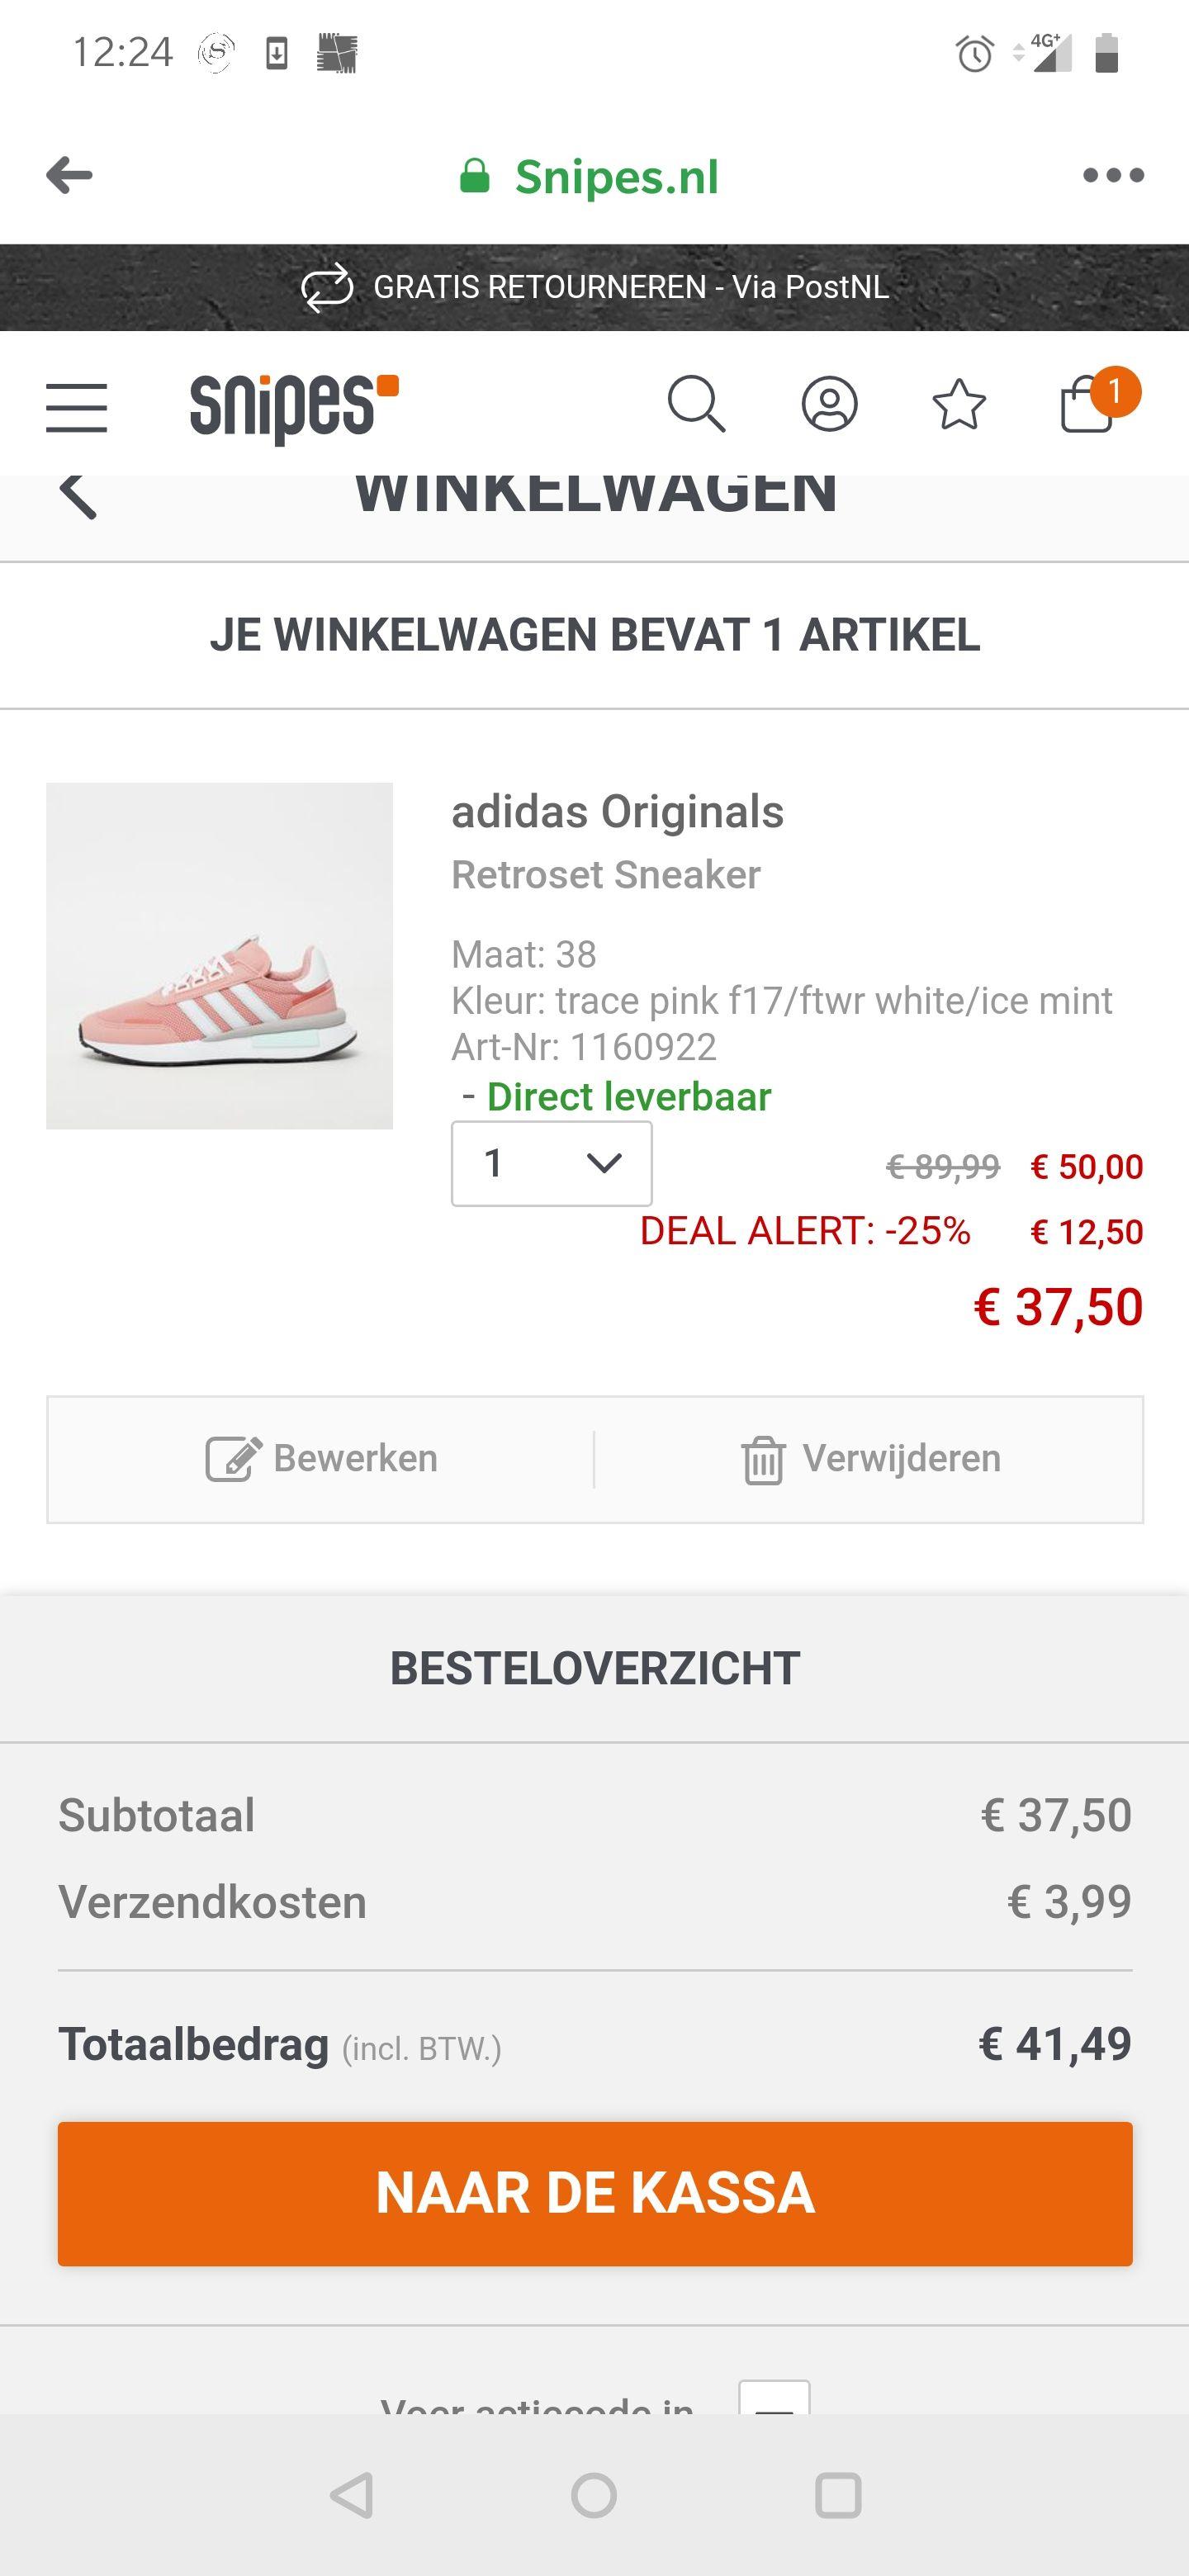 Adidas original 37,50 bij snipes